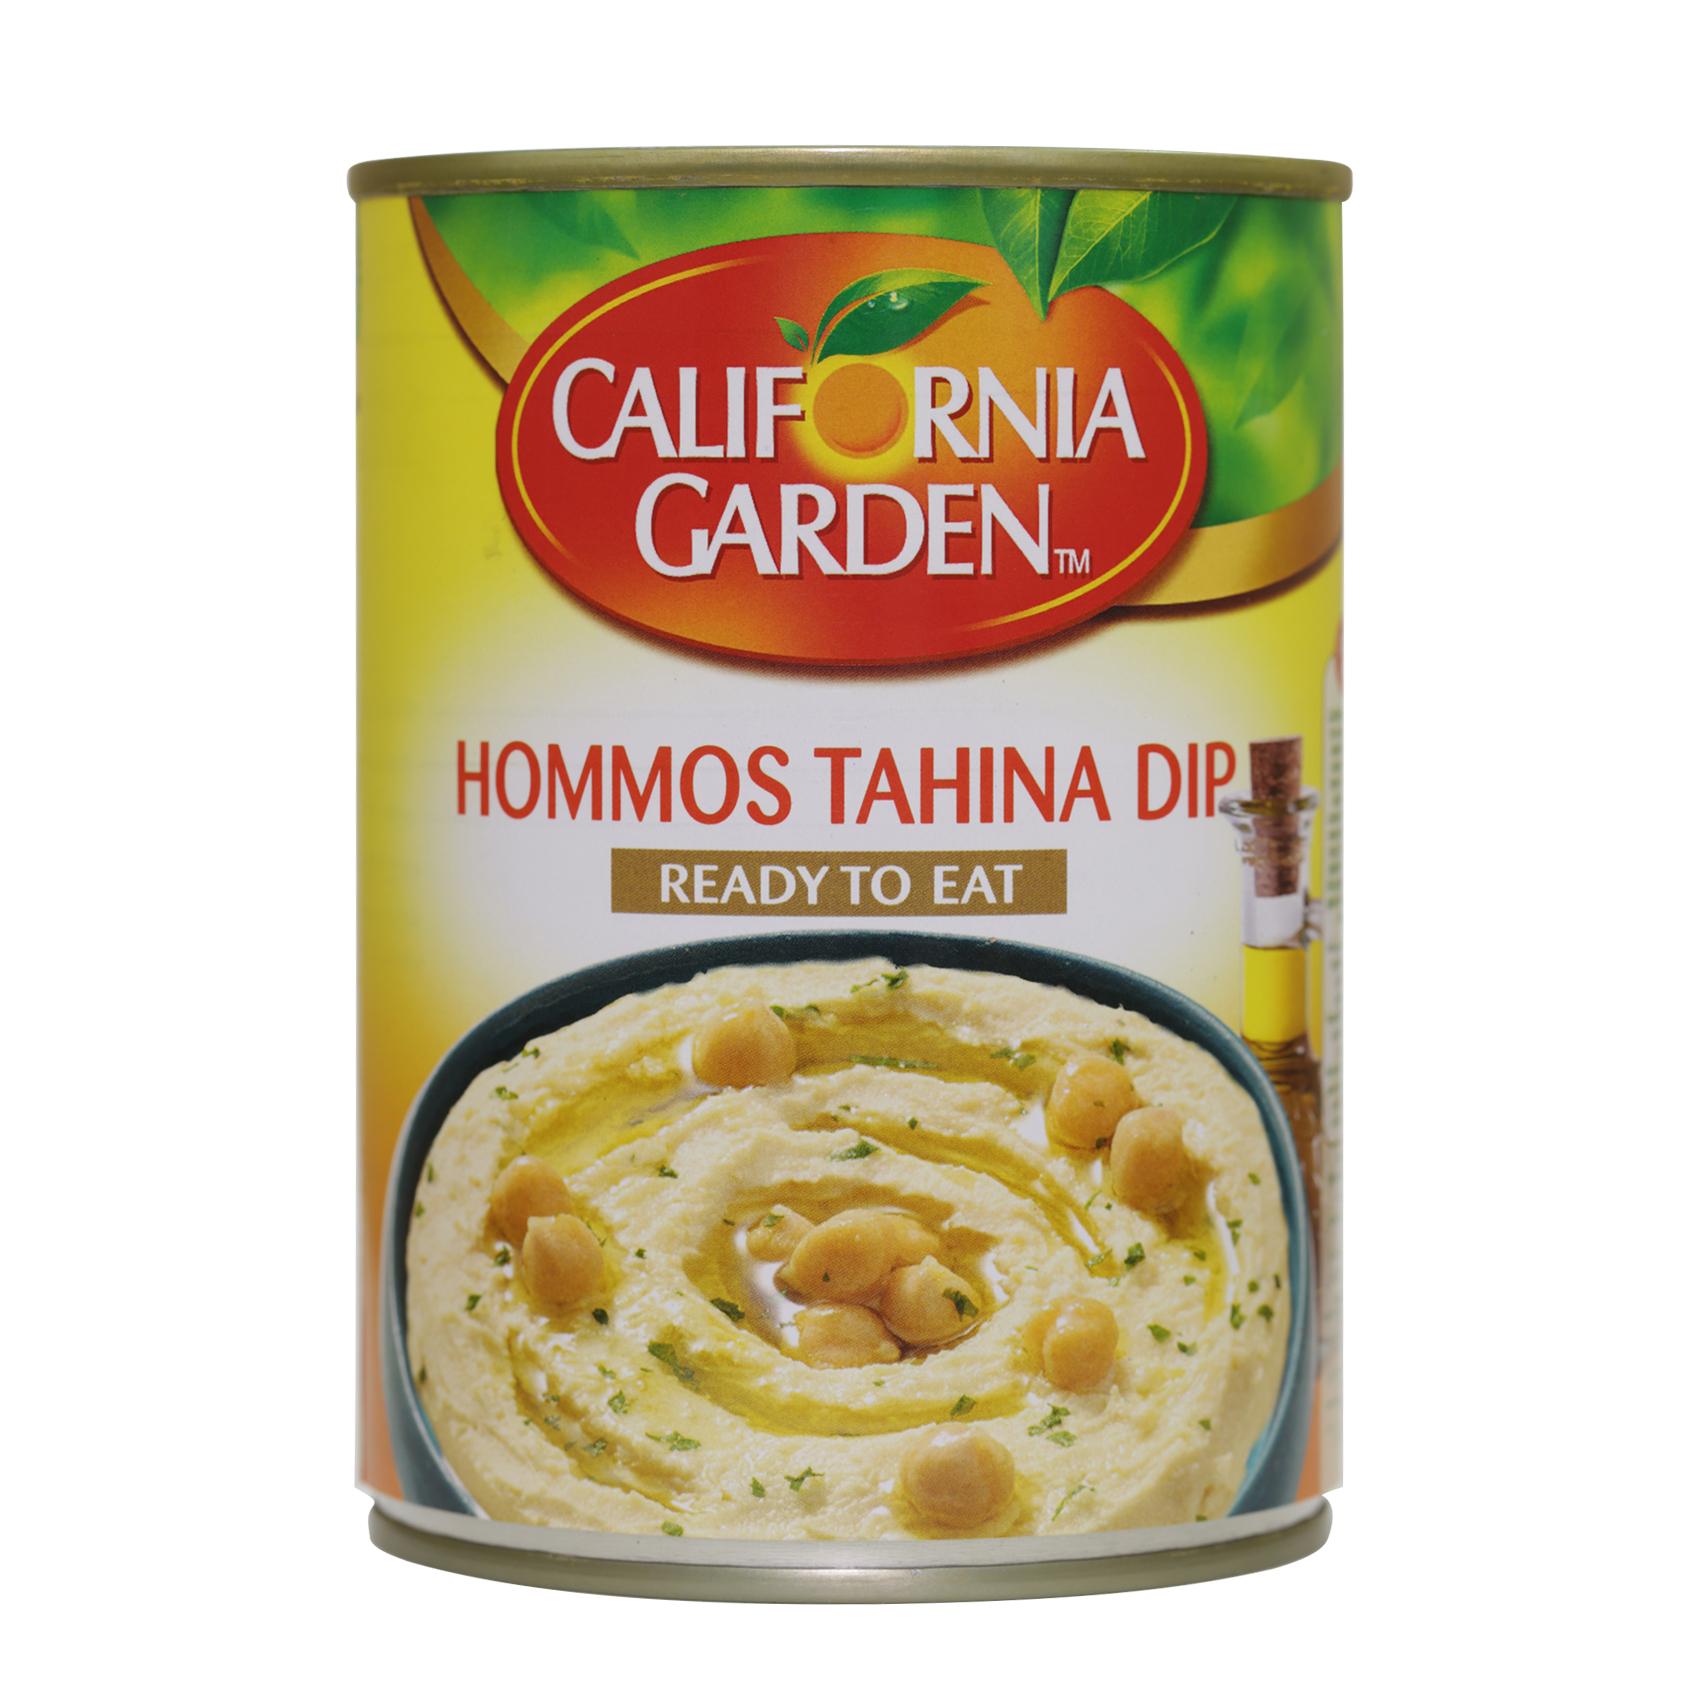 CALIFORNIA GHOMMOS TAHINA 400GR